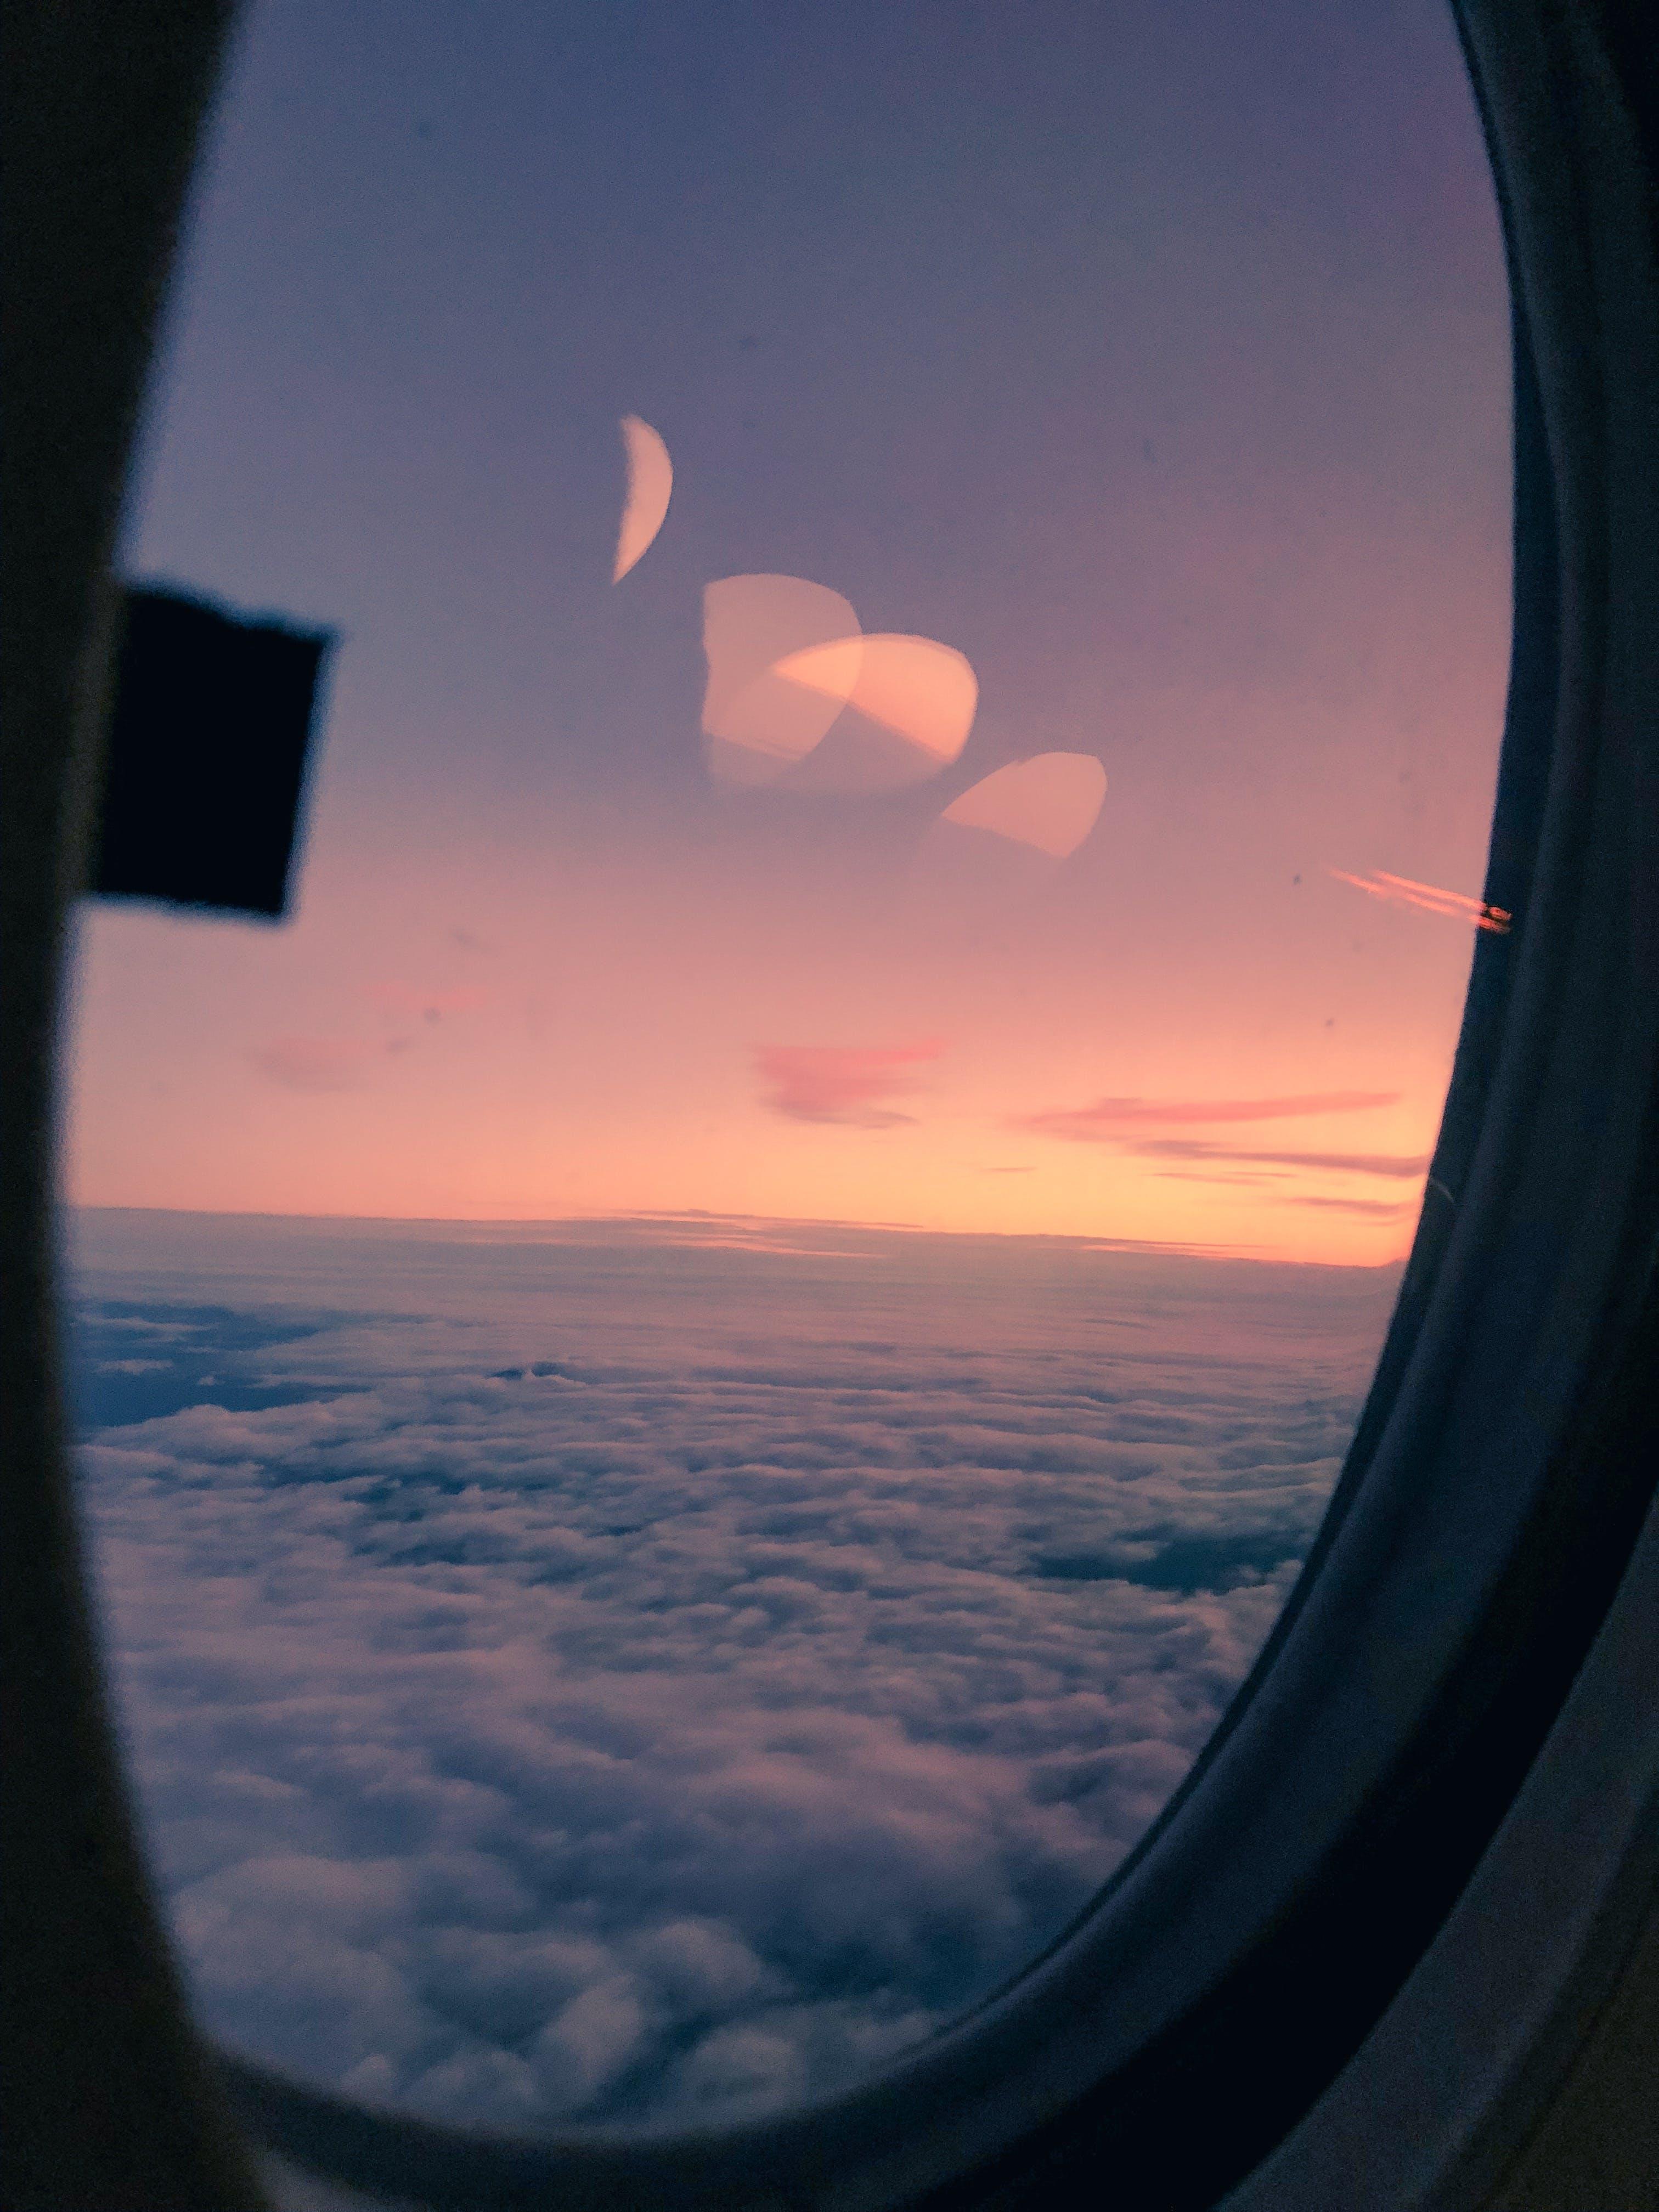 Kostenloses Stock Foto zu atmosphäre, aviate, bewölkt, dämmerung